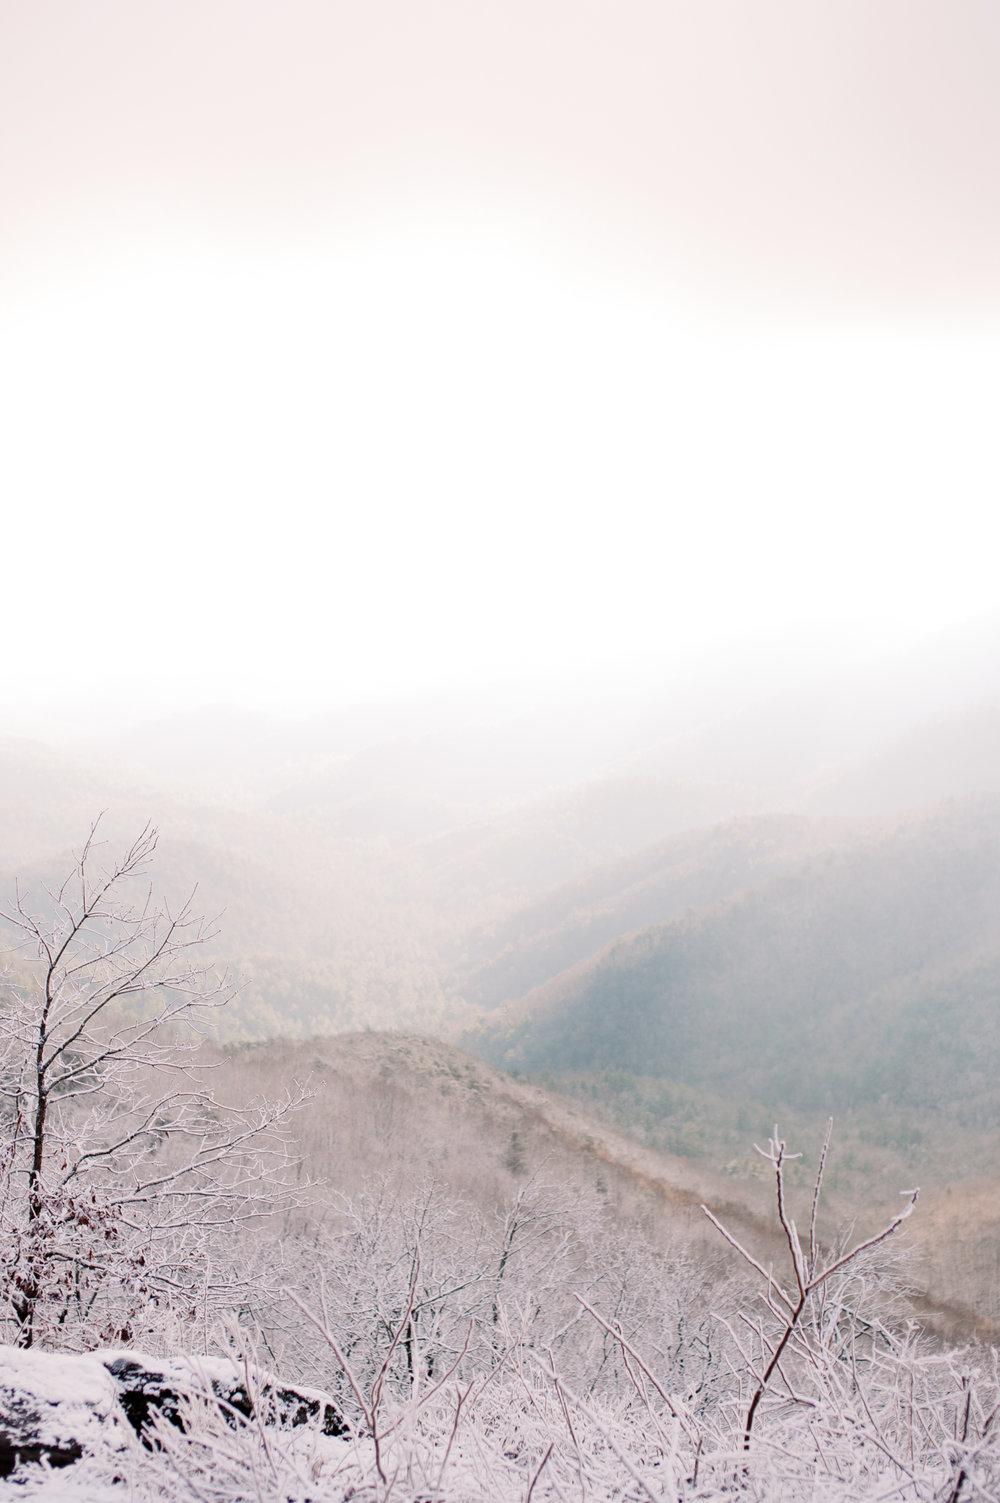 snowy-georgia-proposal-preachers-rock-atlanta-dahlonega-wedding-photographer-hannah-forsberg-fine-art-film-27.jpg